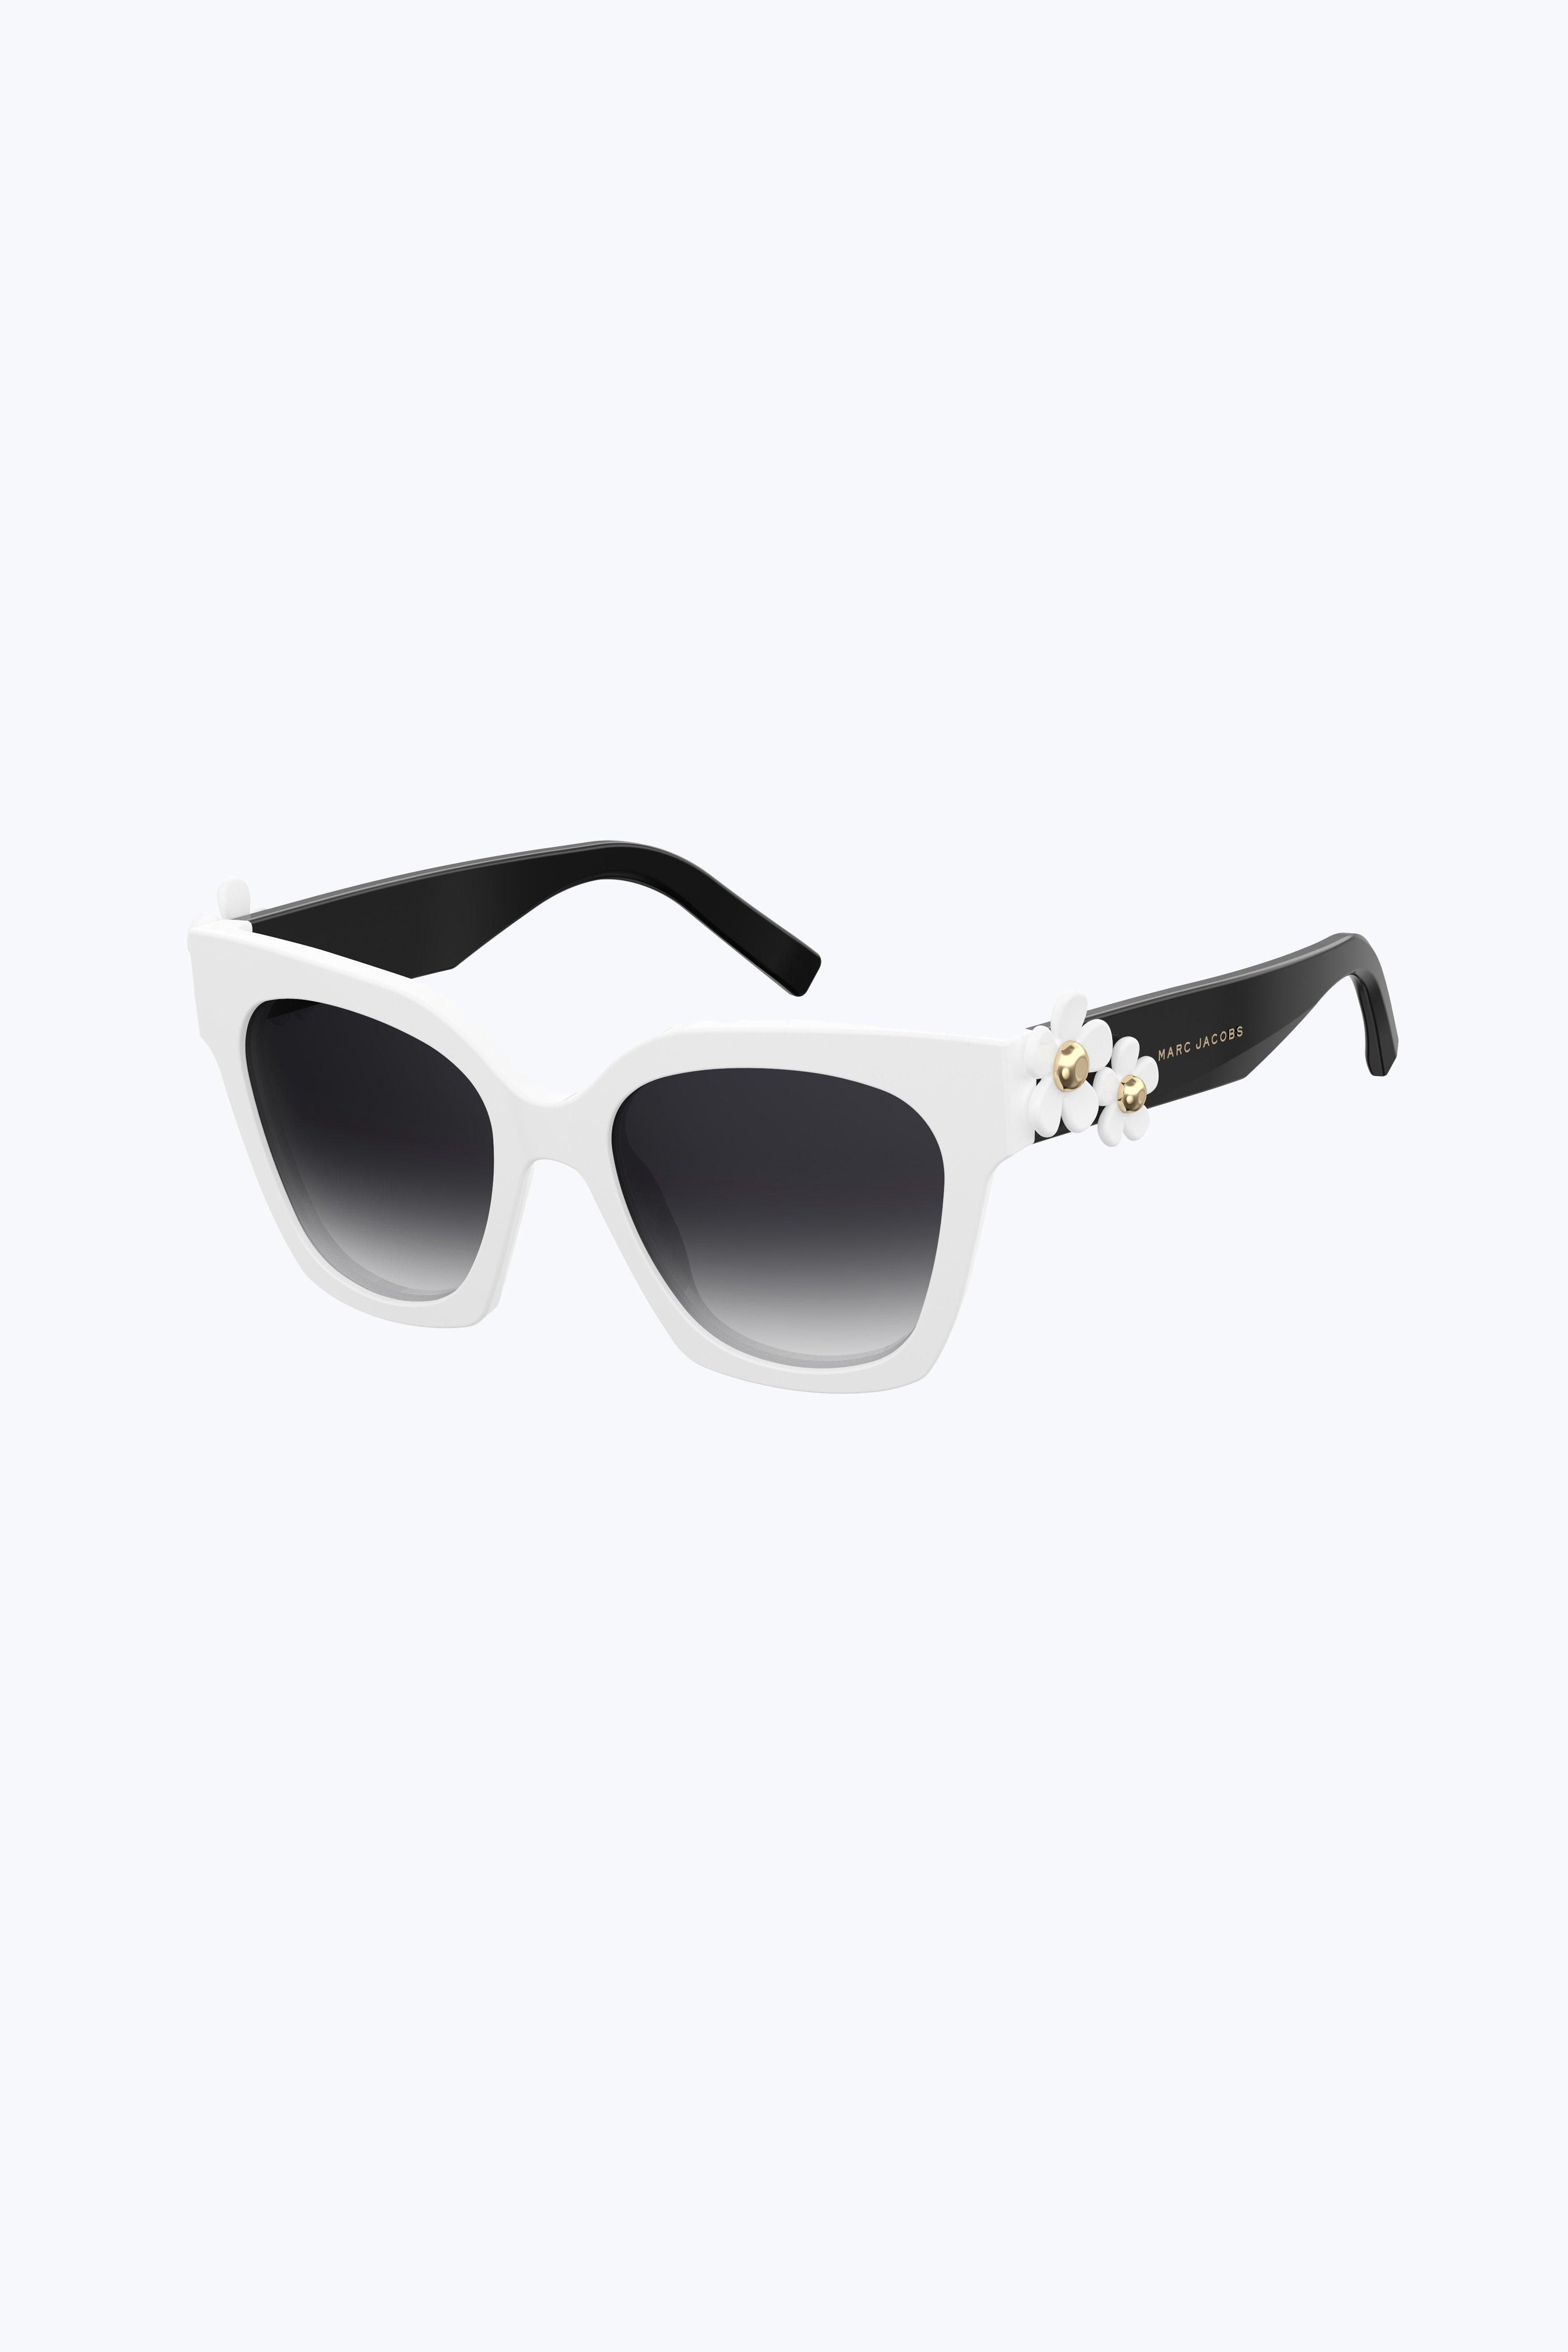 8fc049a203 Marc Jacobs Daisy Square Sunglasses - White Dark Grey 1Sz